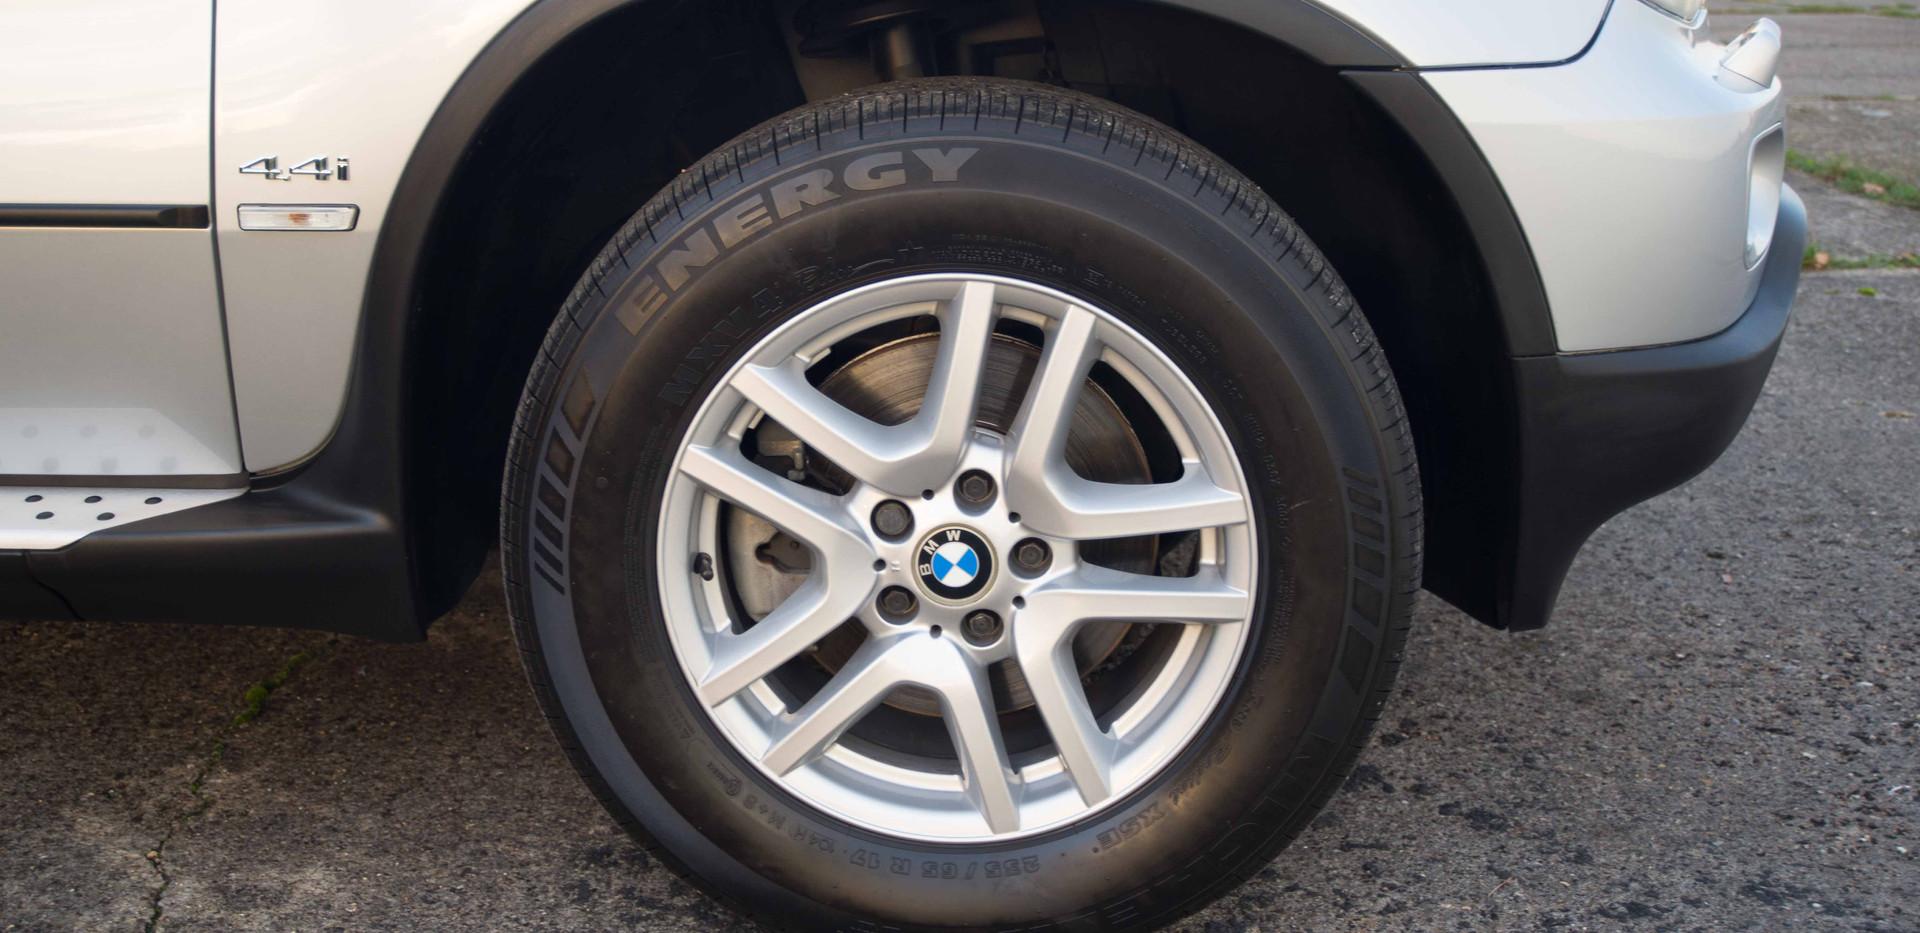 BMW E53 X5 4.4i For Sale UK London  (29